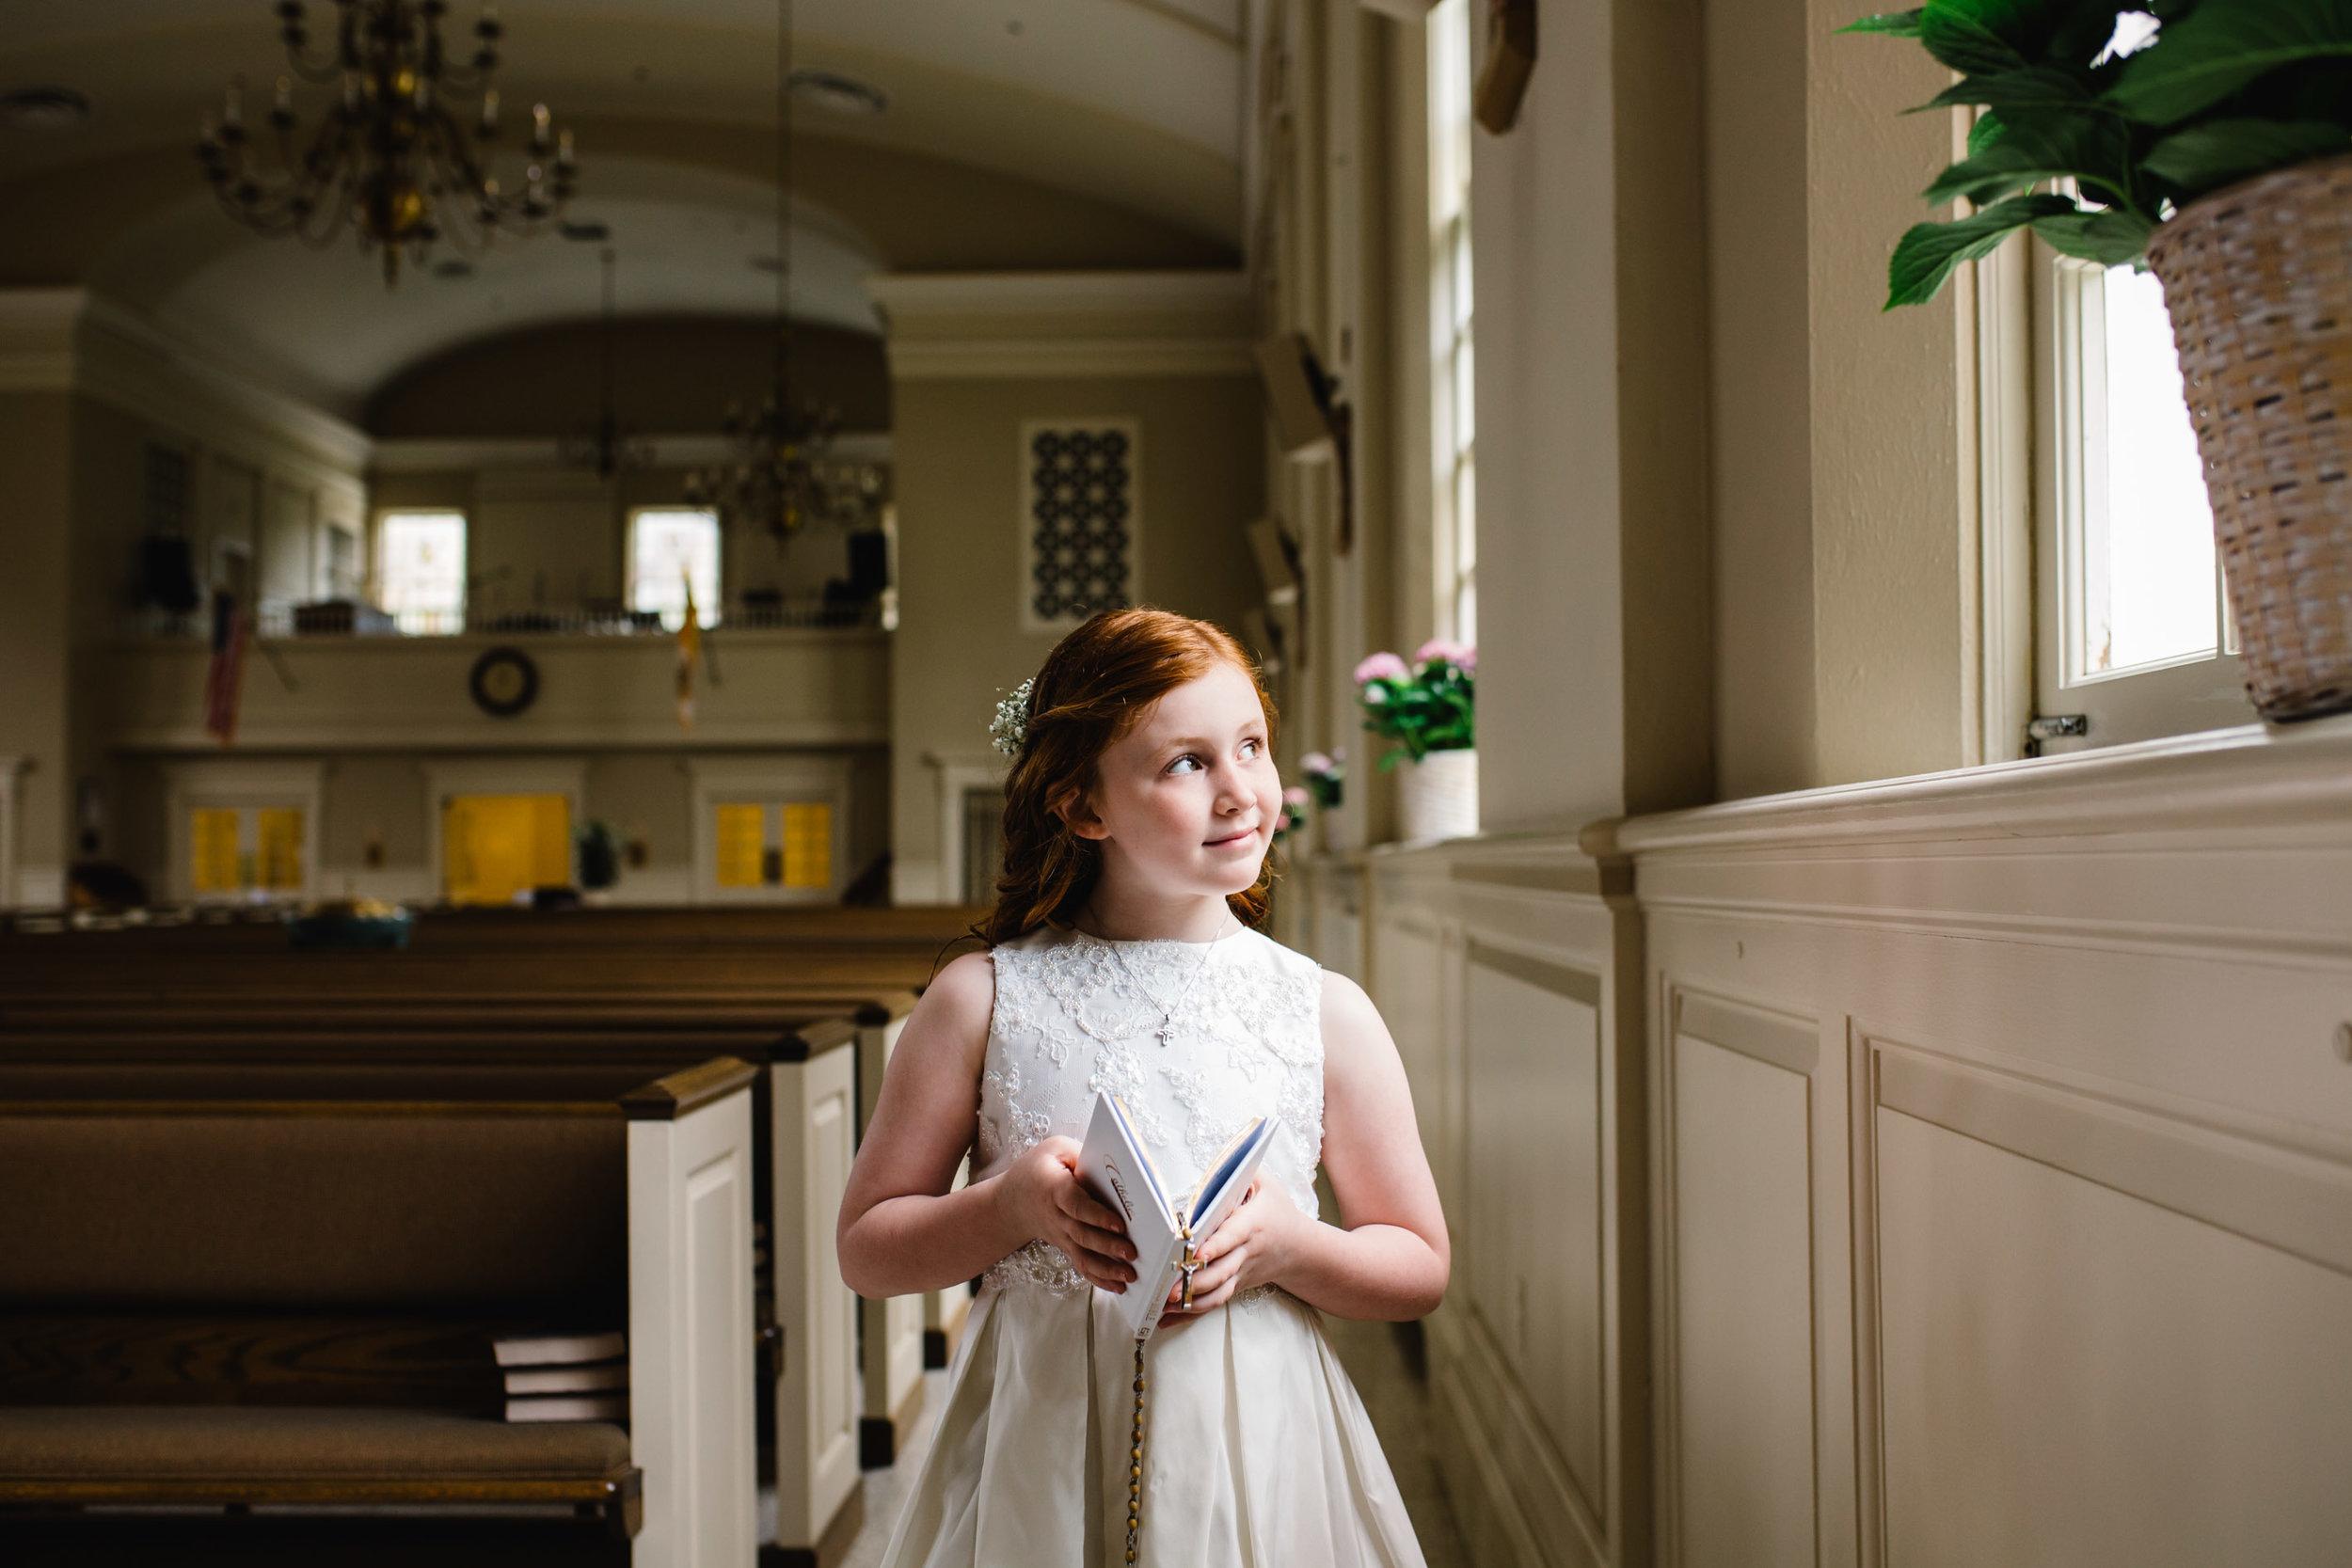 first communion portrait session at church | Jennifer Tippett Photography